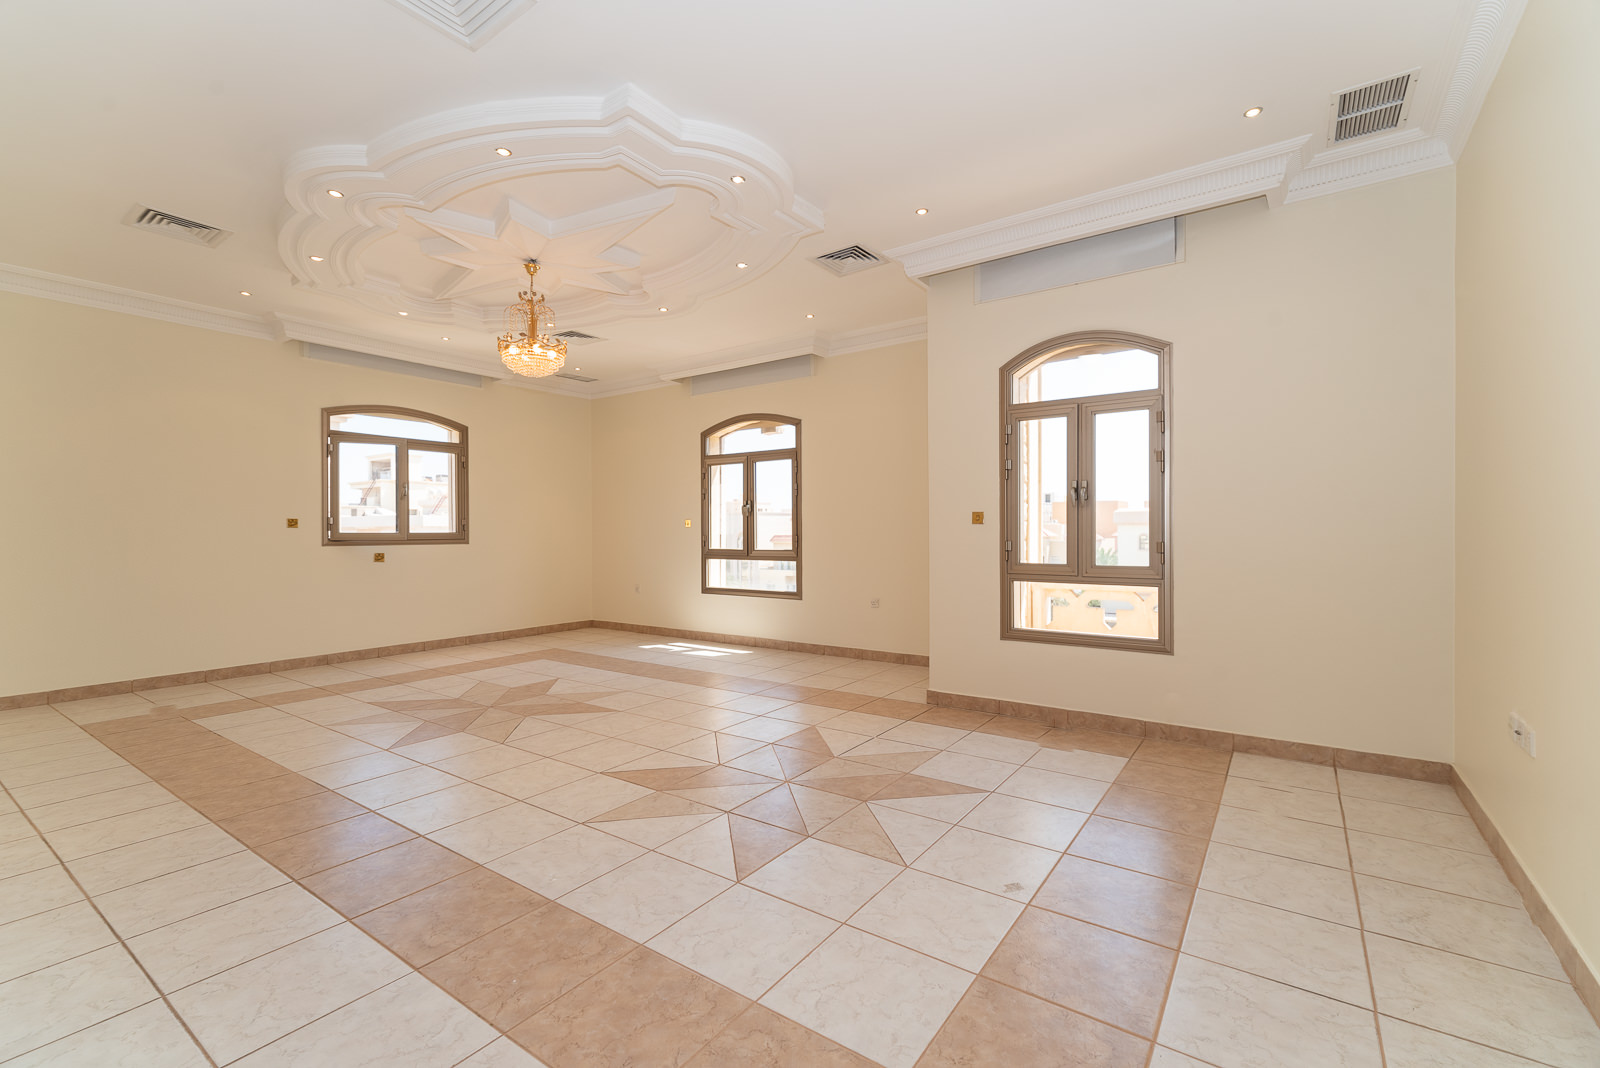 West Mishref – spacious, unfurnished, five bedroom floor